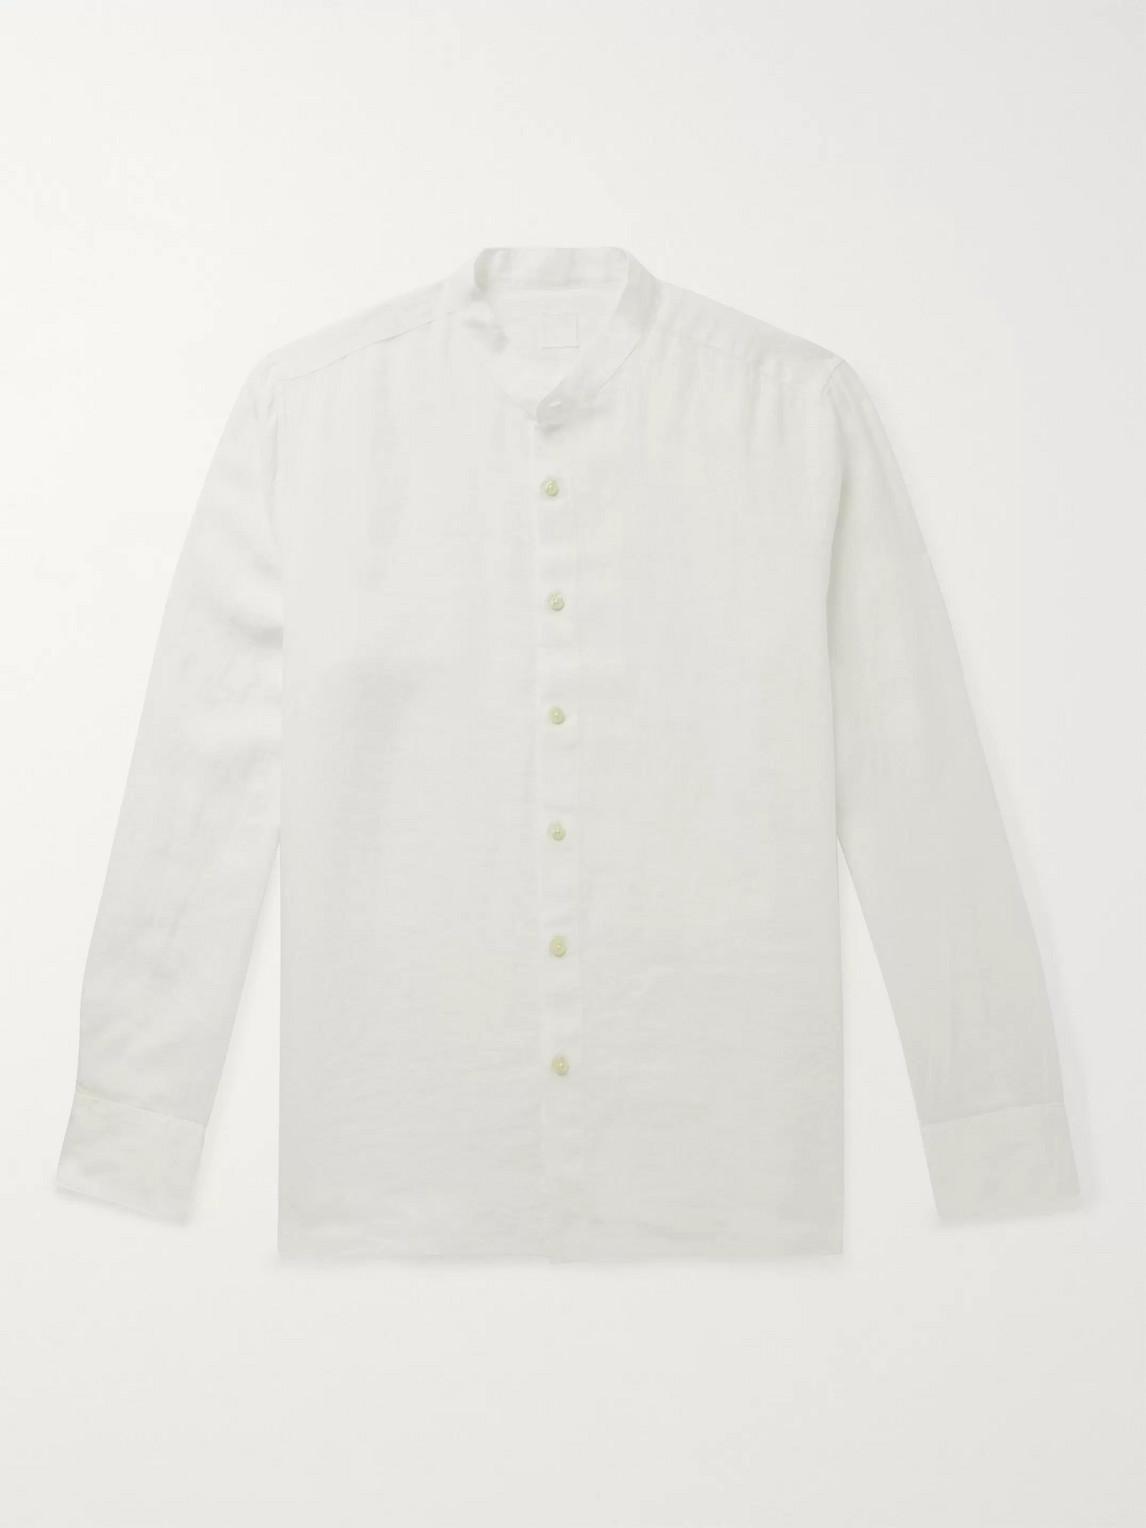 120% Slim-fit Grandad-collar Garment-dyed Linen Shirt In White